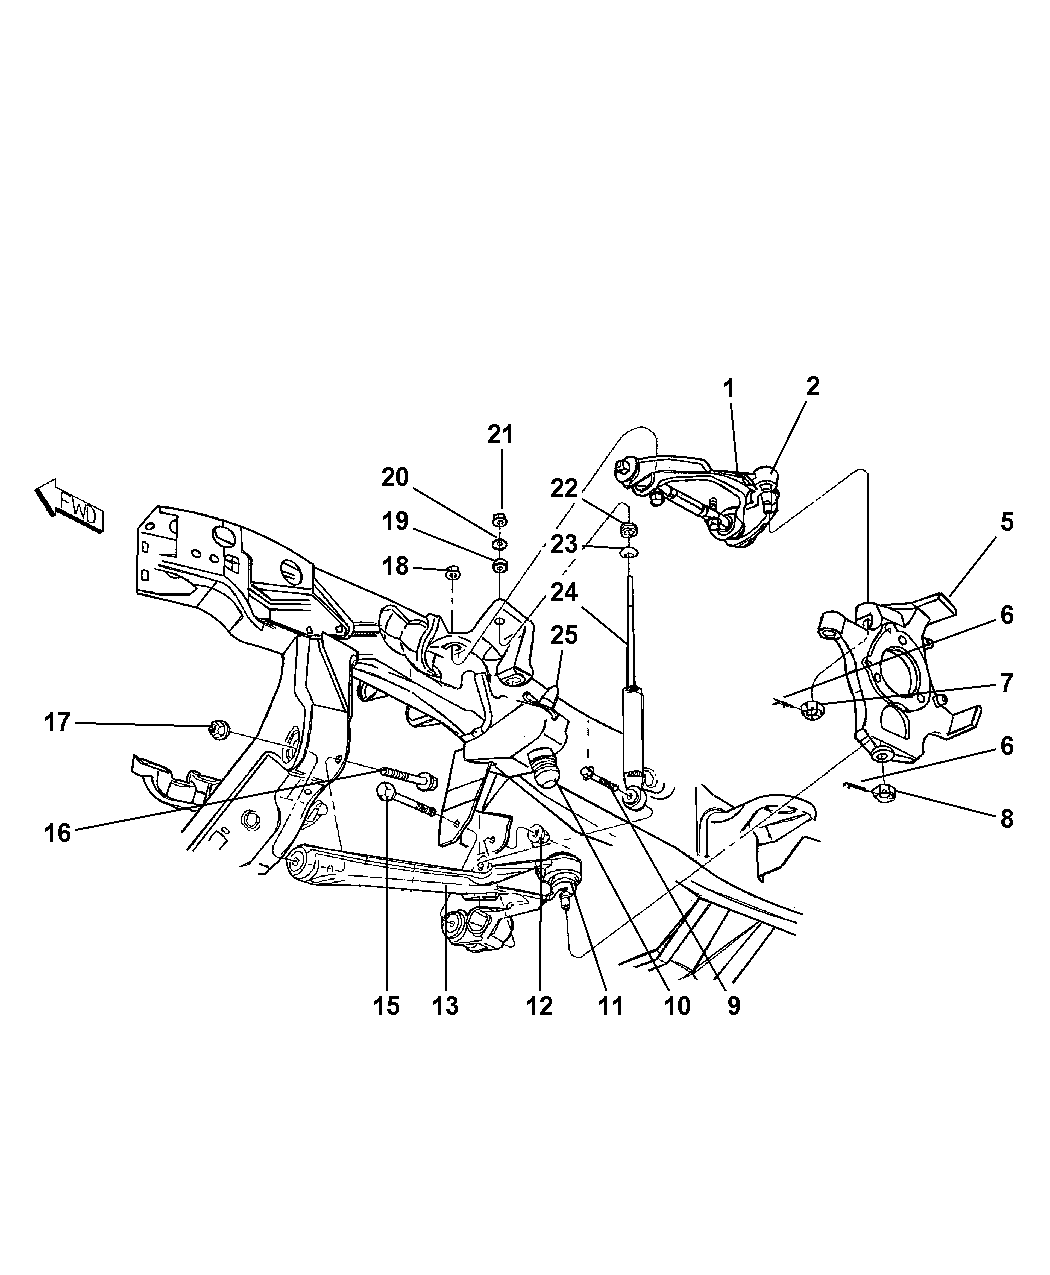 2001 Dodge Dakota Parts Diagram - Wiring Diagram